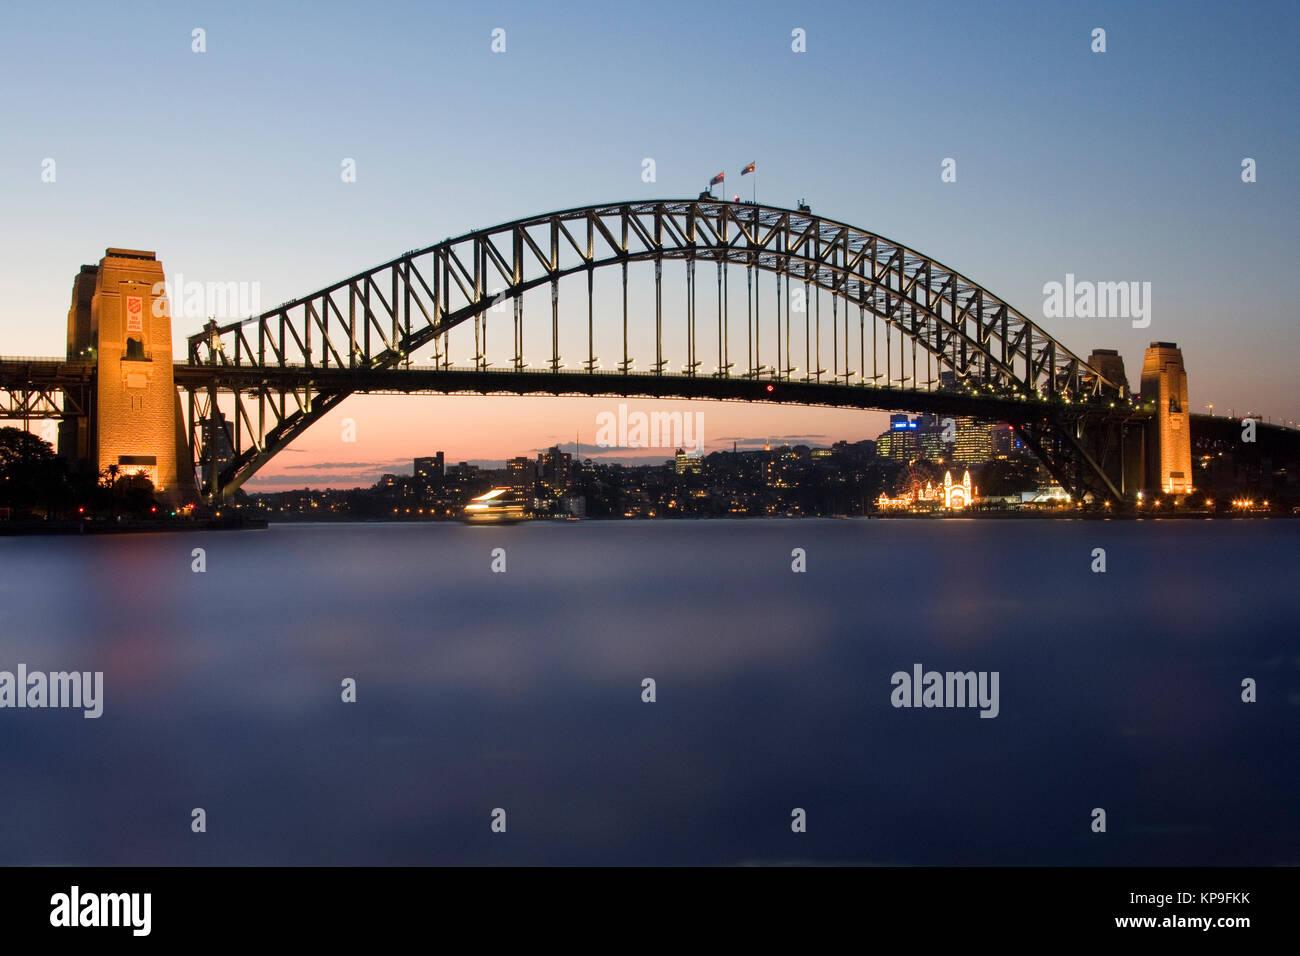 Sydney Harbor Bridge in Sydney Harbor, New South Wales, Australia. Opened in 1932, it carries rail, road traffic, - Stock Image